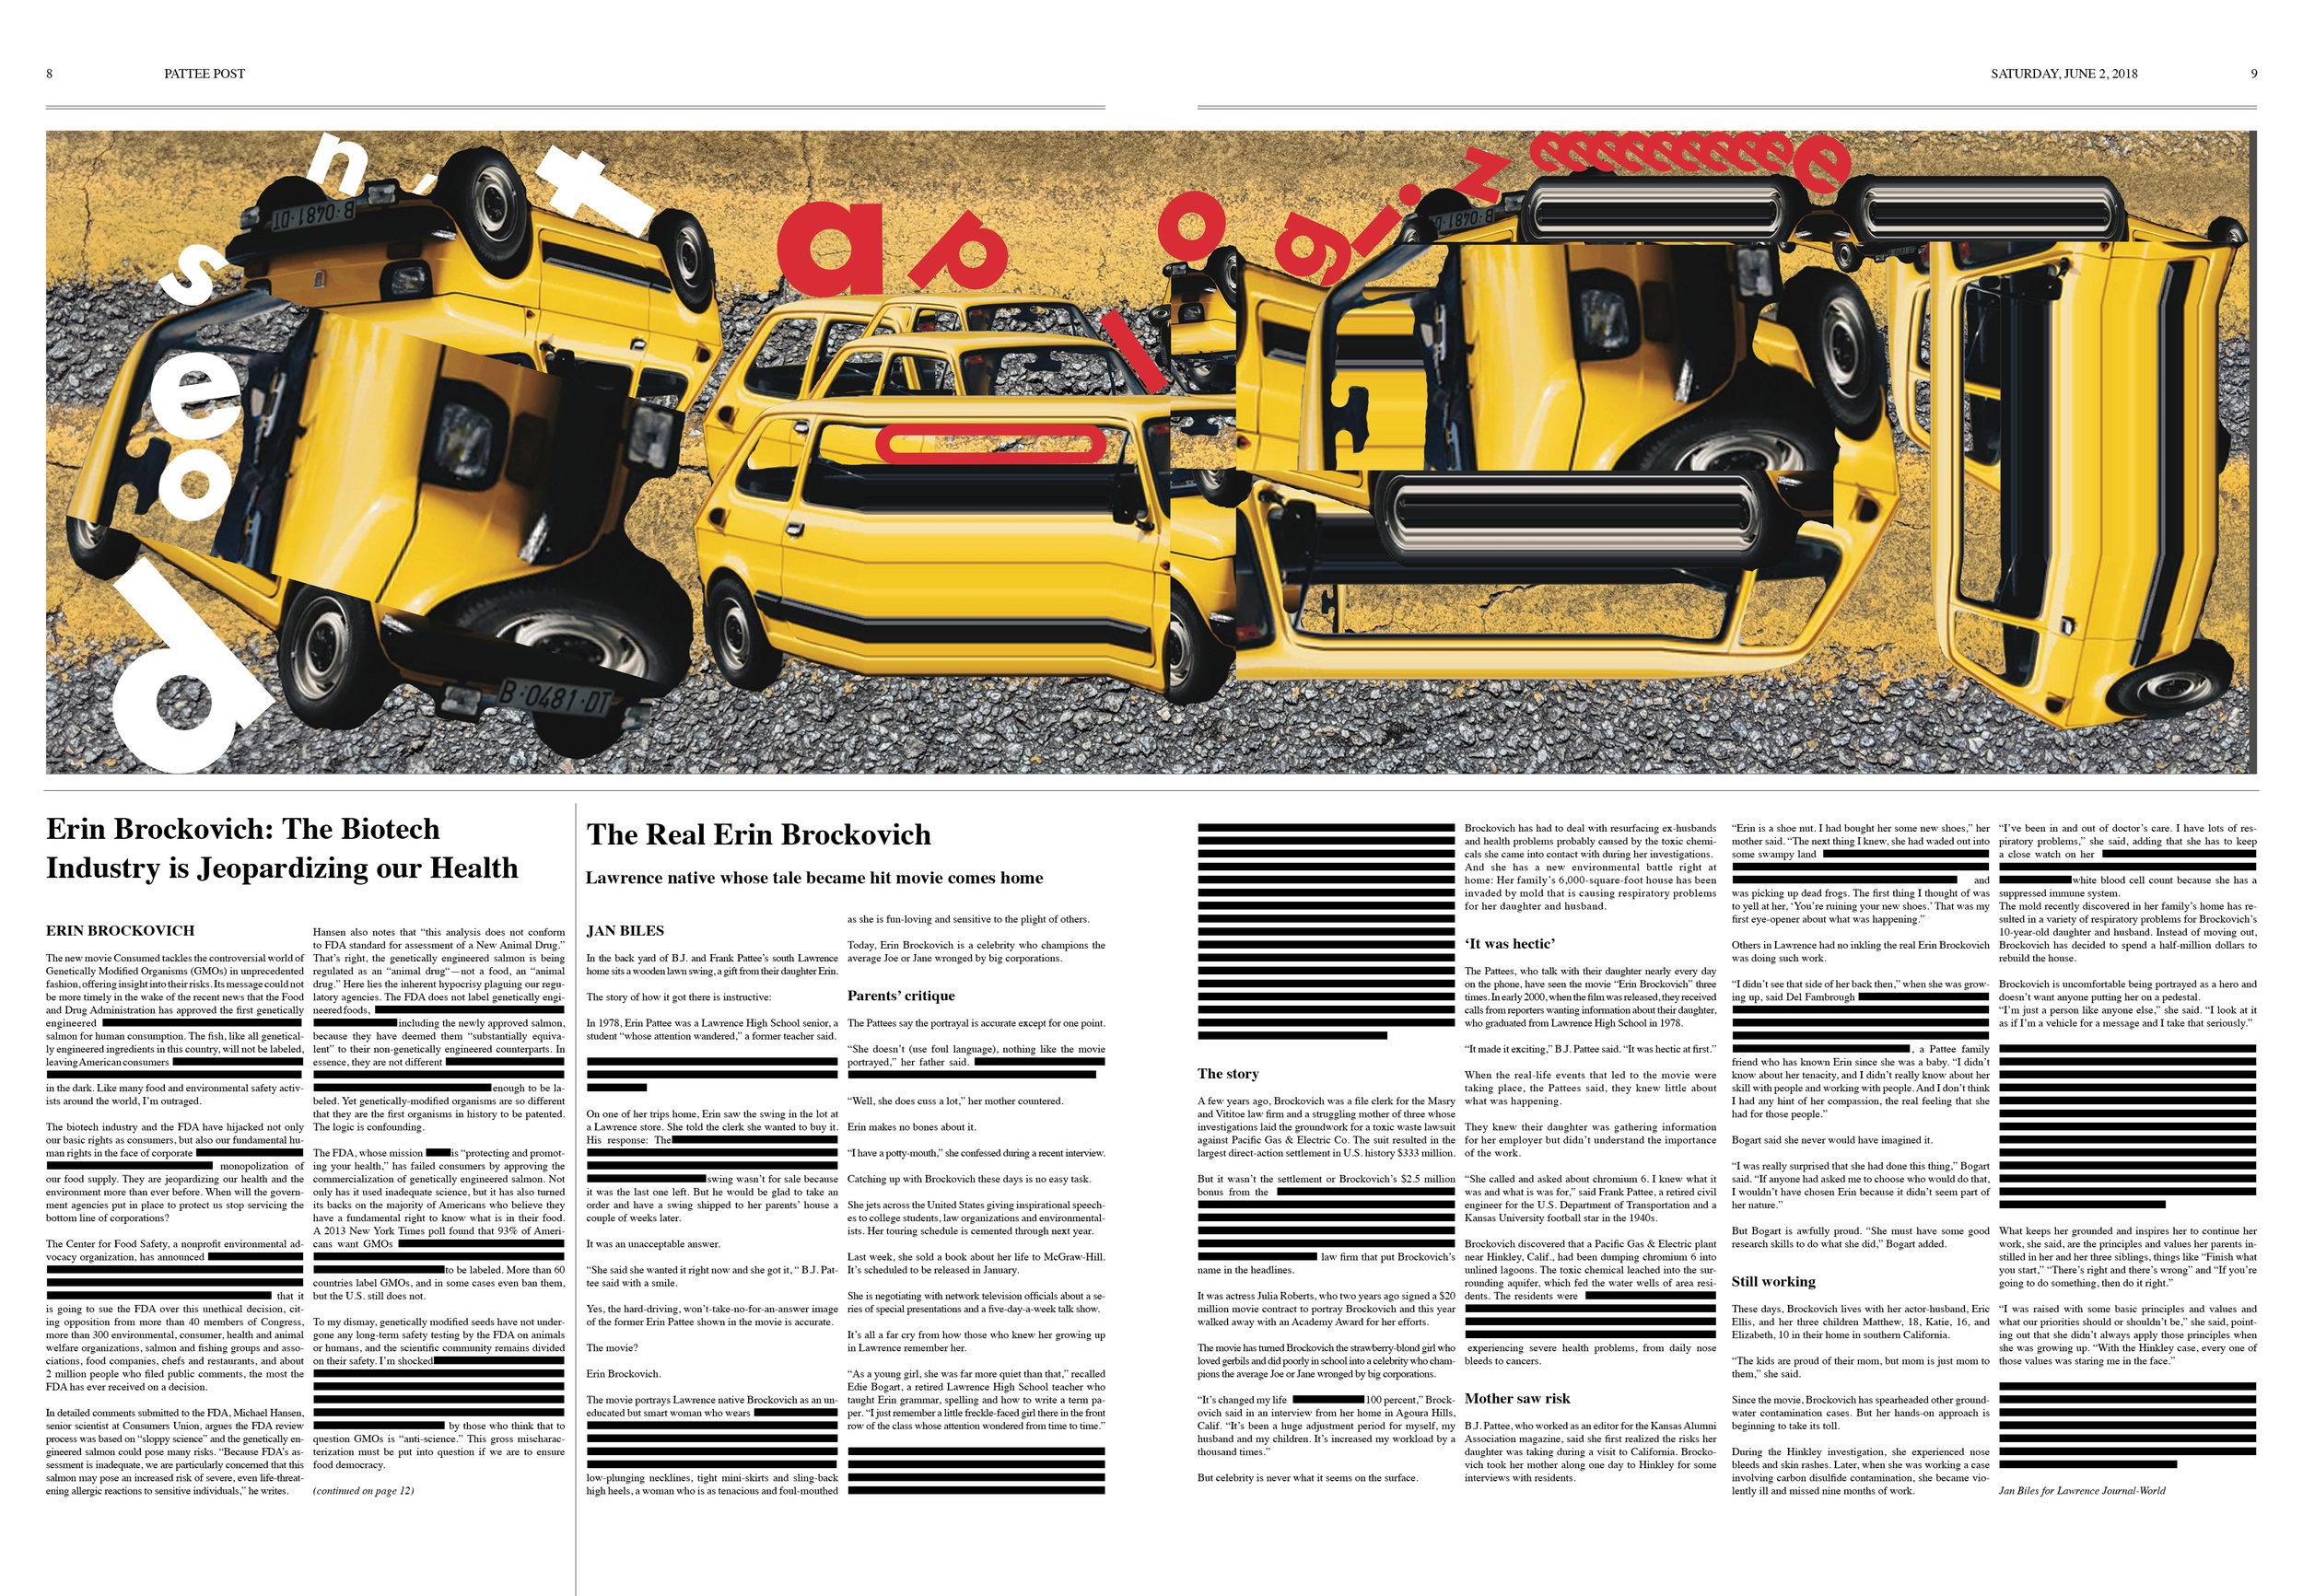 newspaper layout 45.jpg